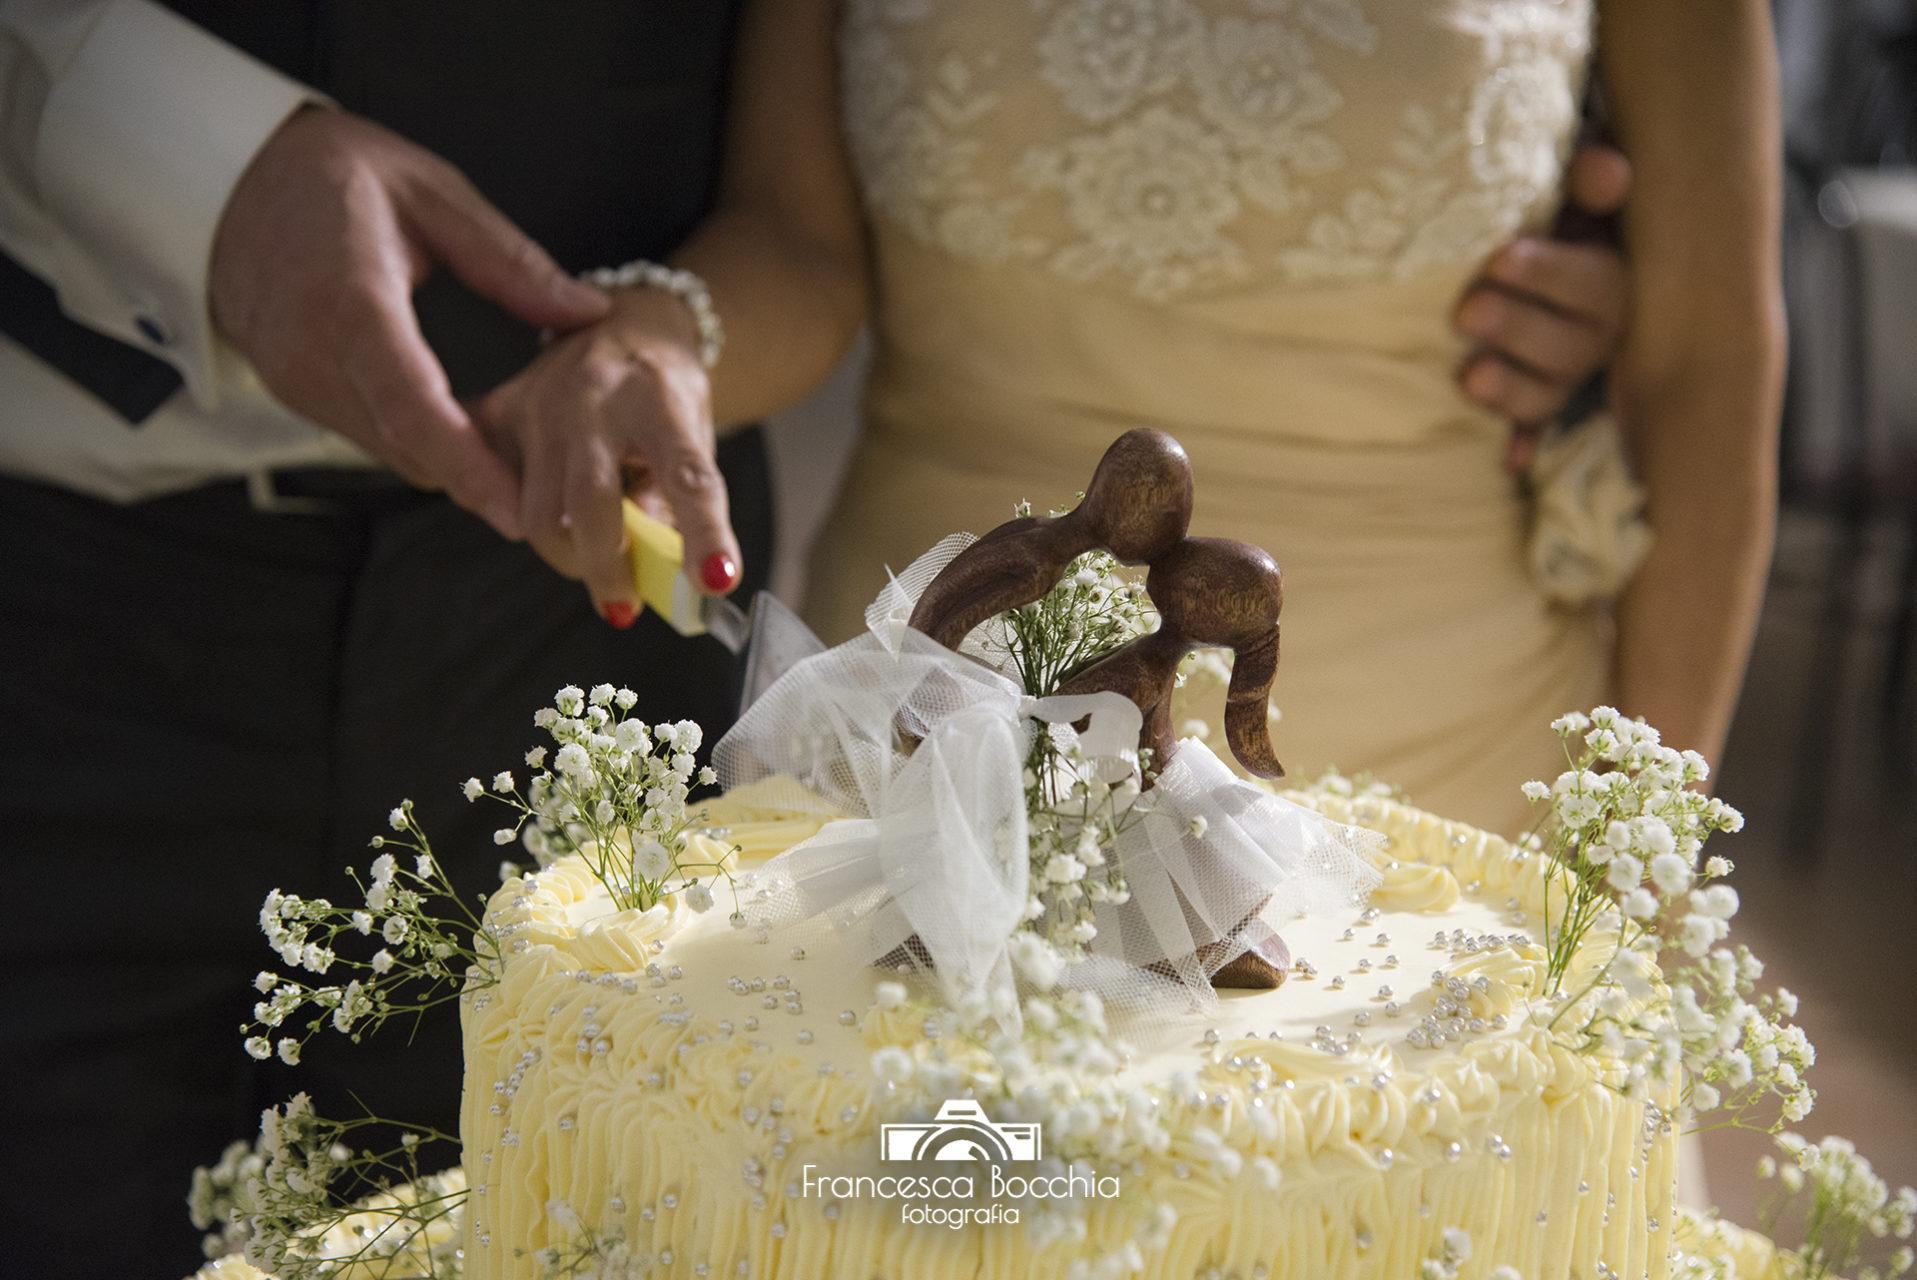 Matrimonio Servizio Fotografico Fotografie Parma Francescabocchiafotografie00004